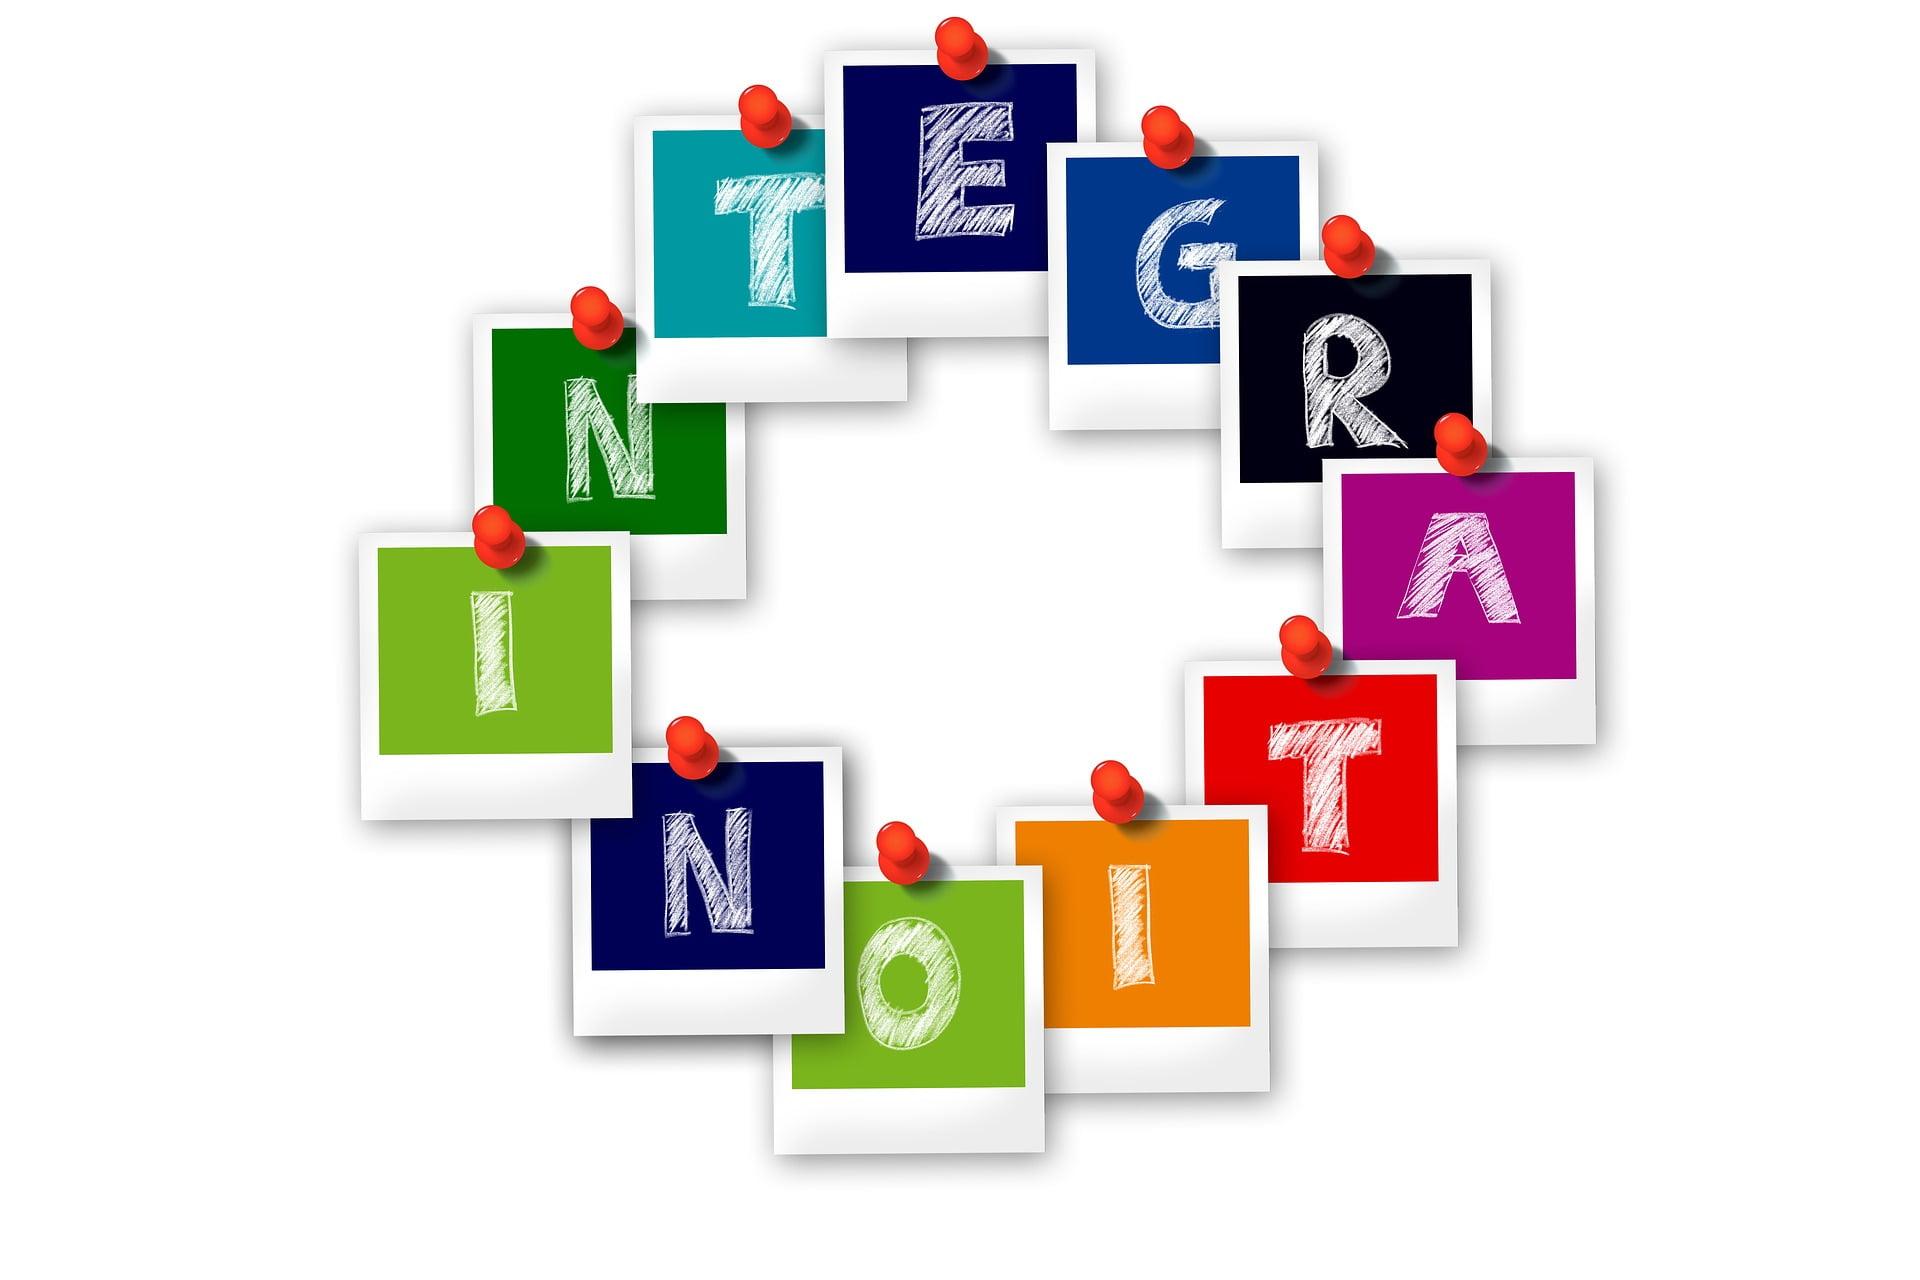 integration-2489600_1920